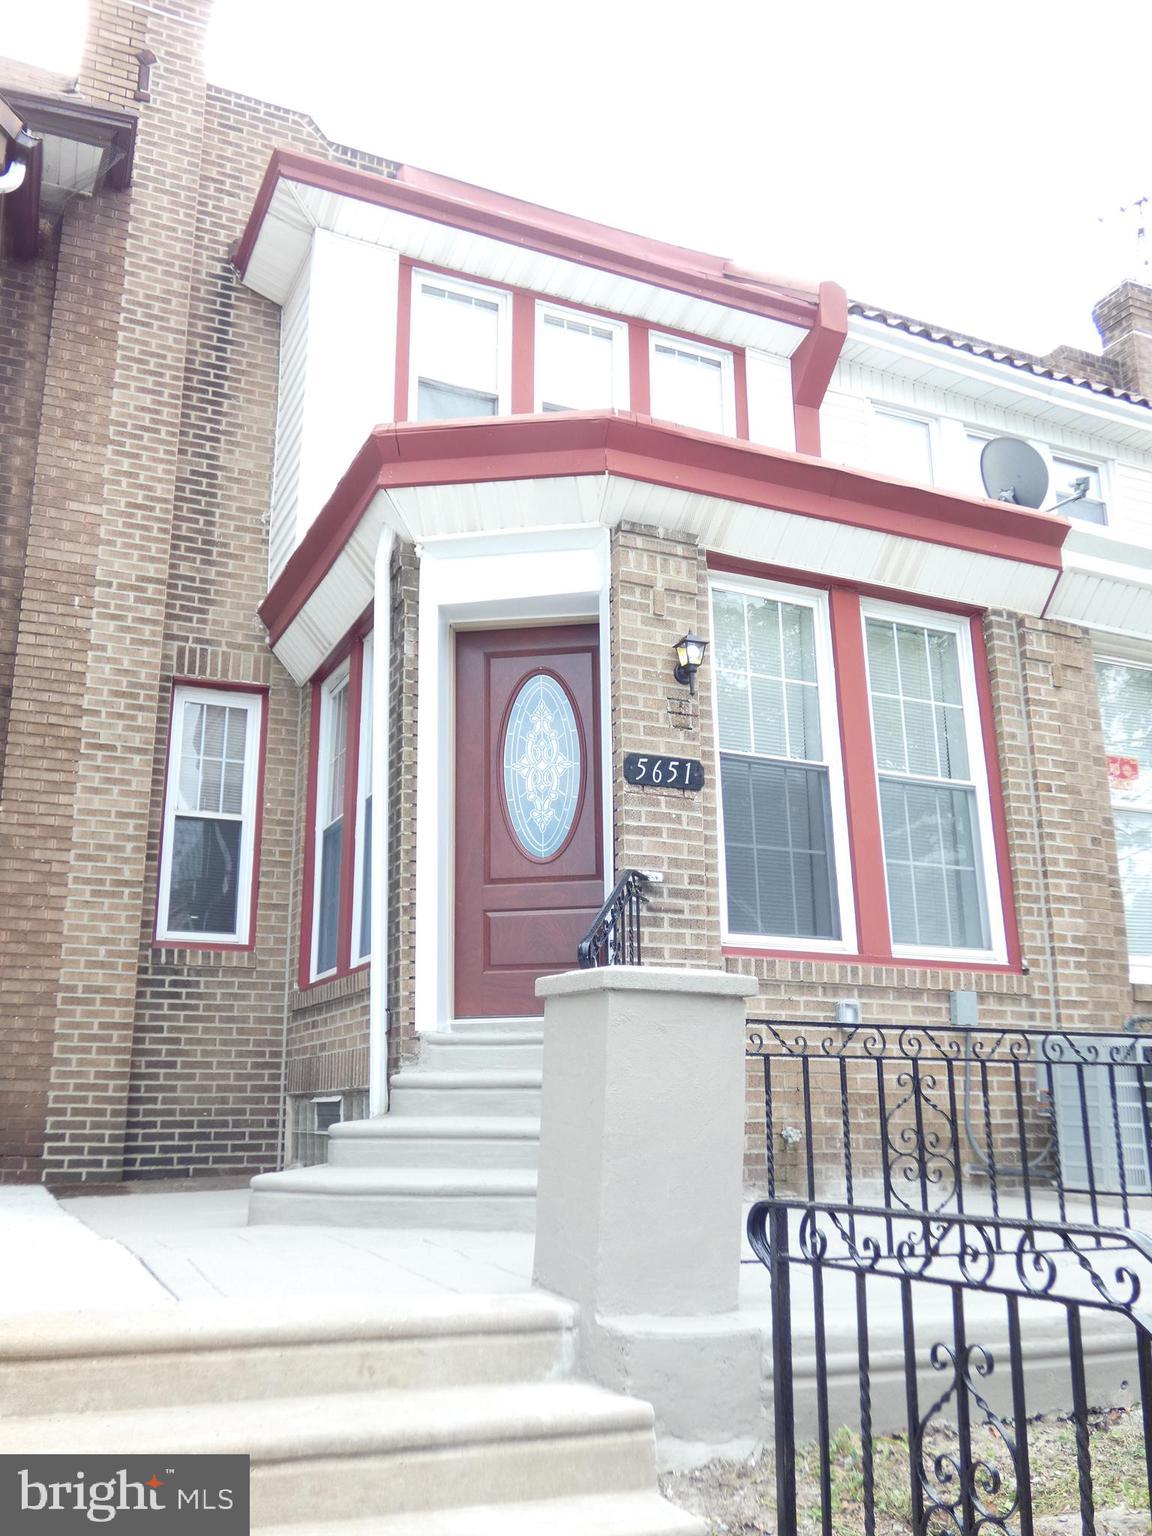 5651 N 10TH STREET, PHILADELPHIA, PA 19141